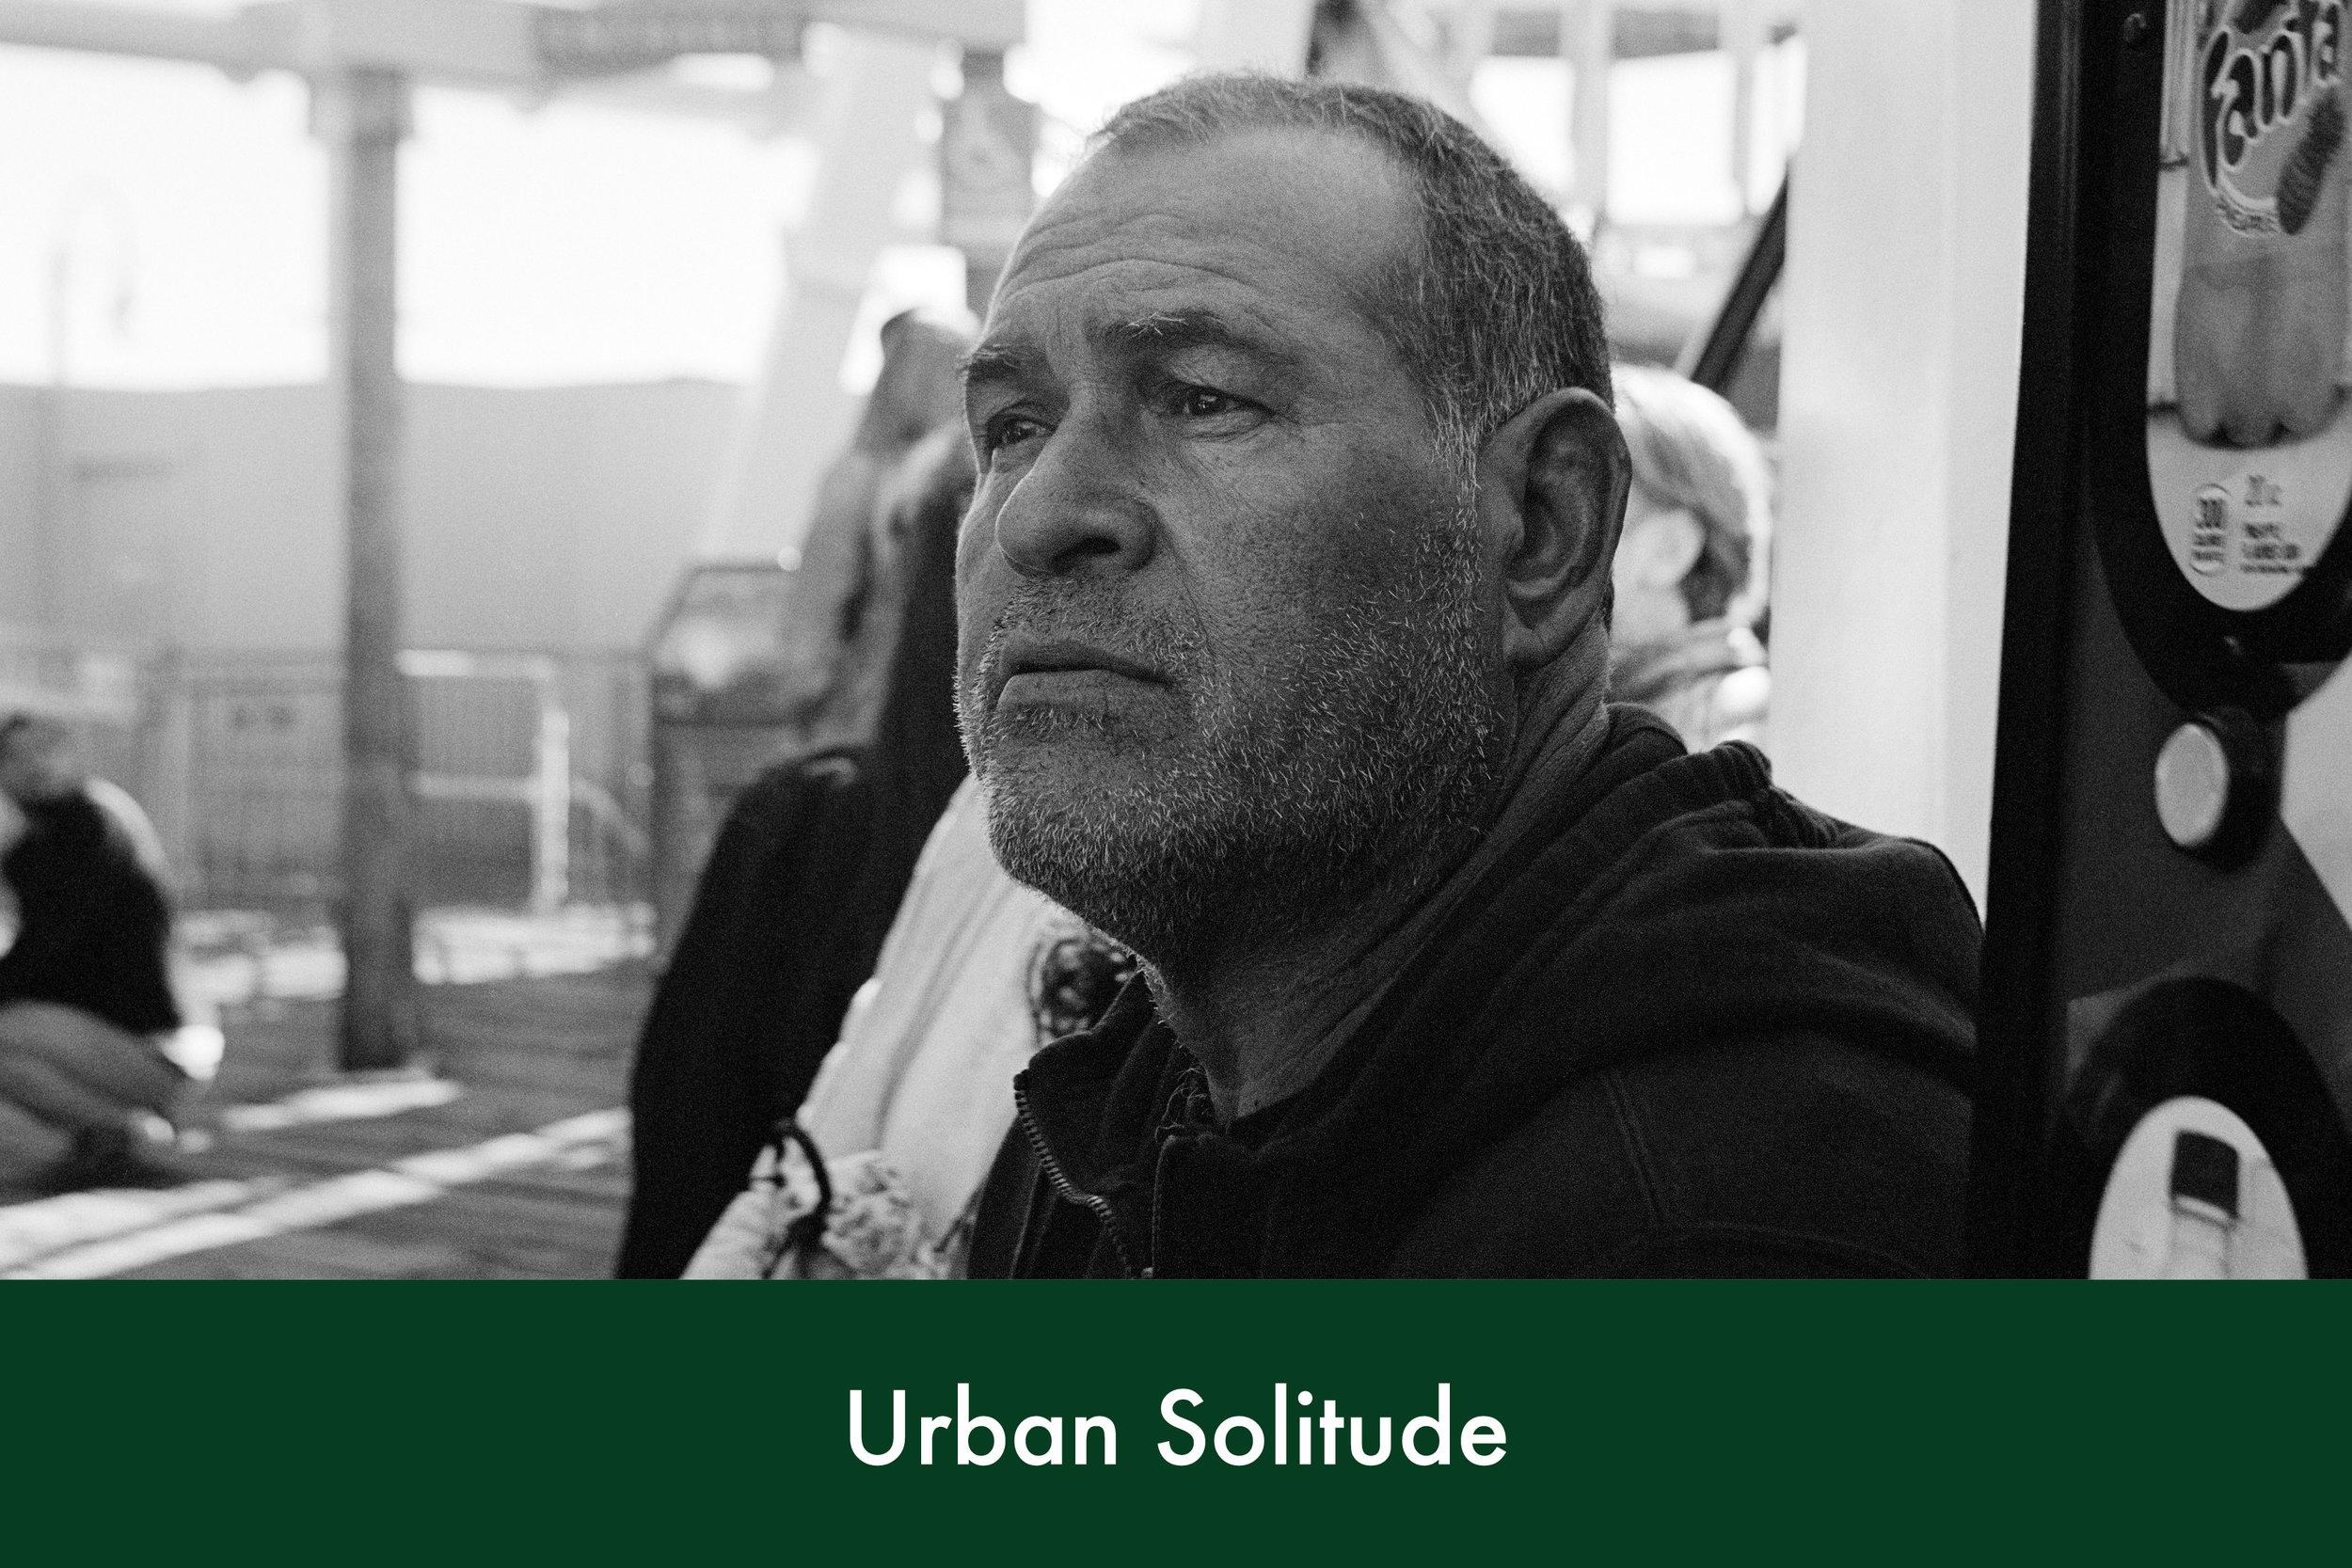 UrbanSolitdeWebTitle.jpg